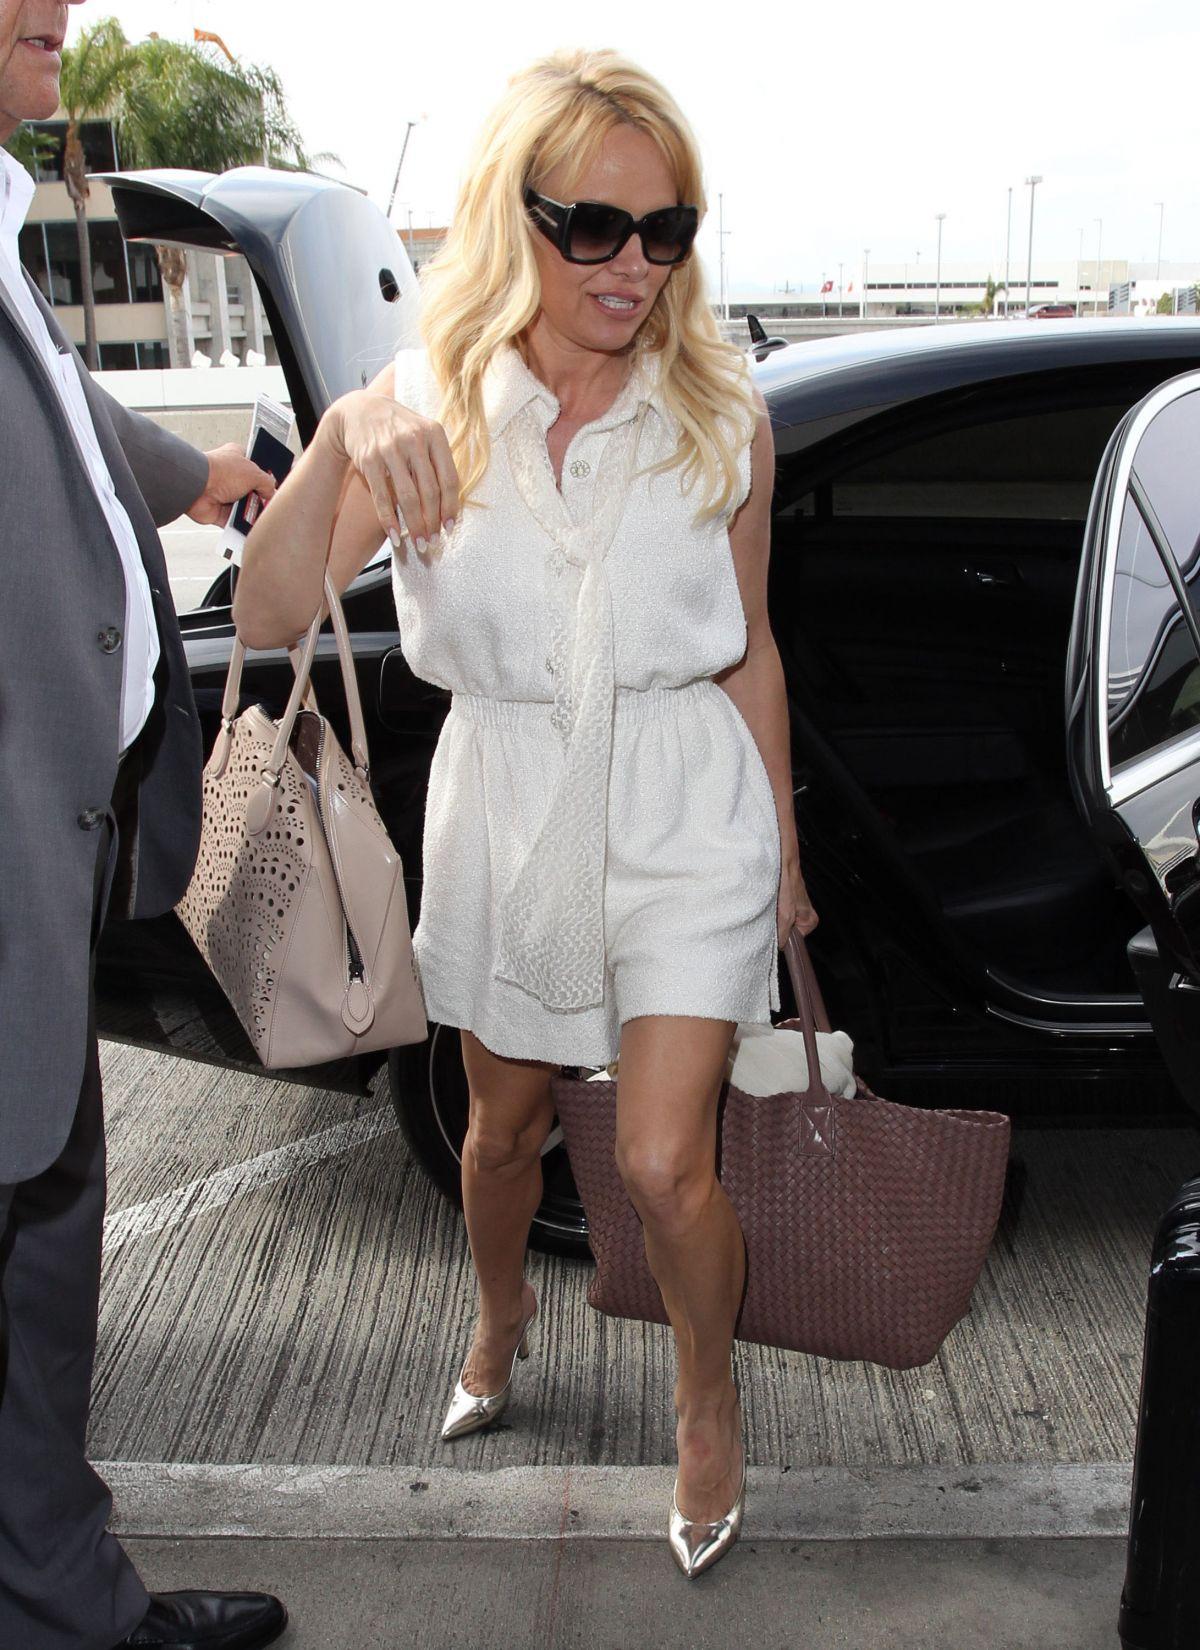 Paparazzi Pamela Anderson nude (84 photo), Ass, Bikini, Instagram, cleavage 2015